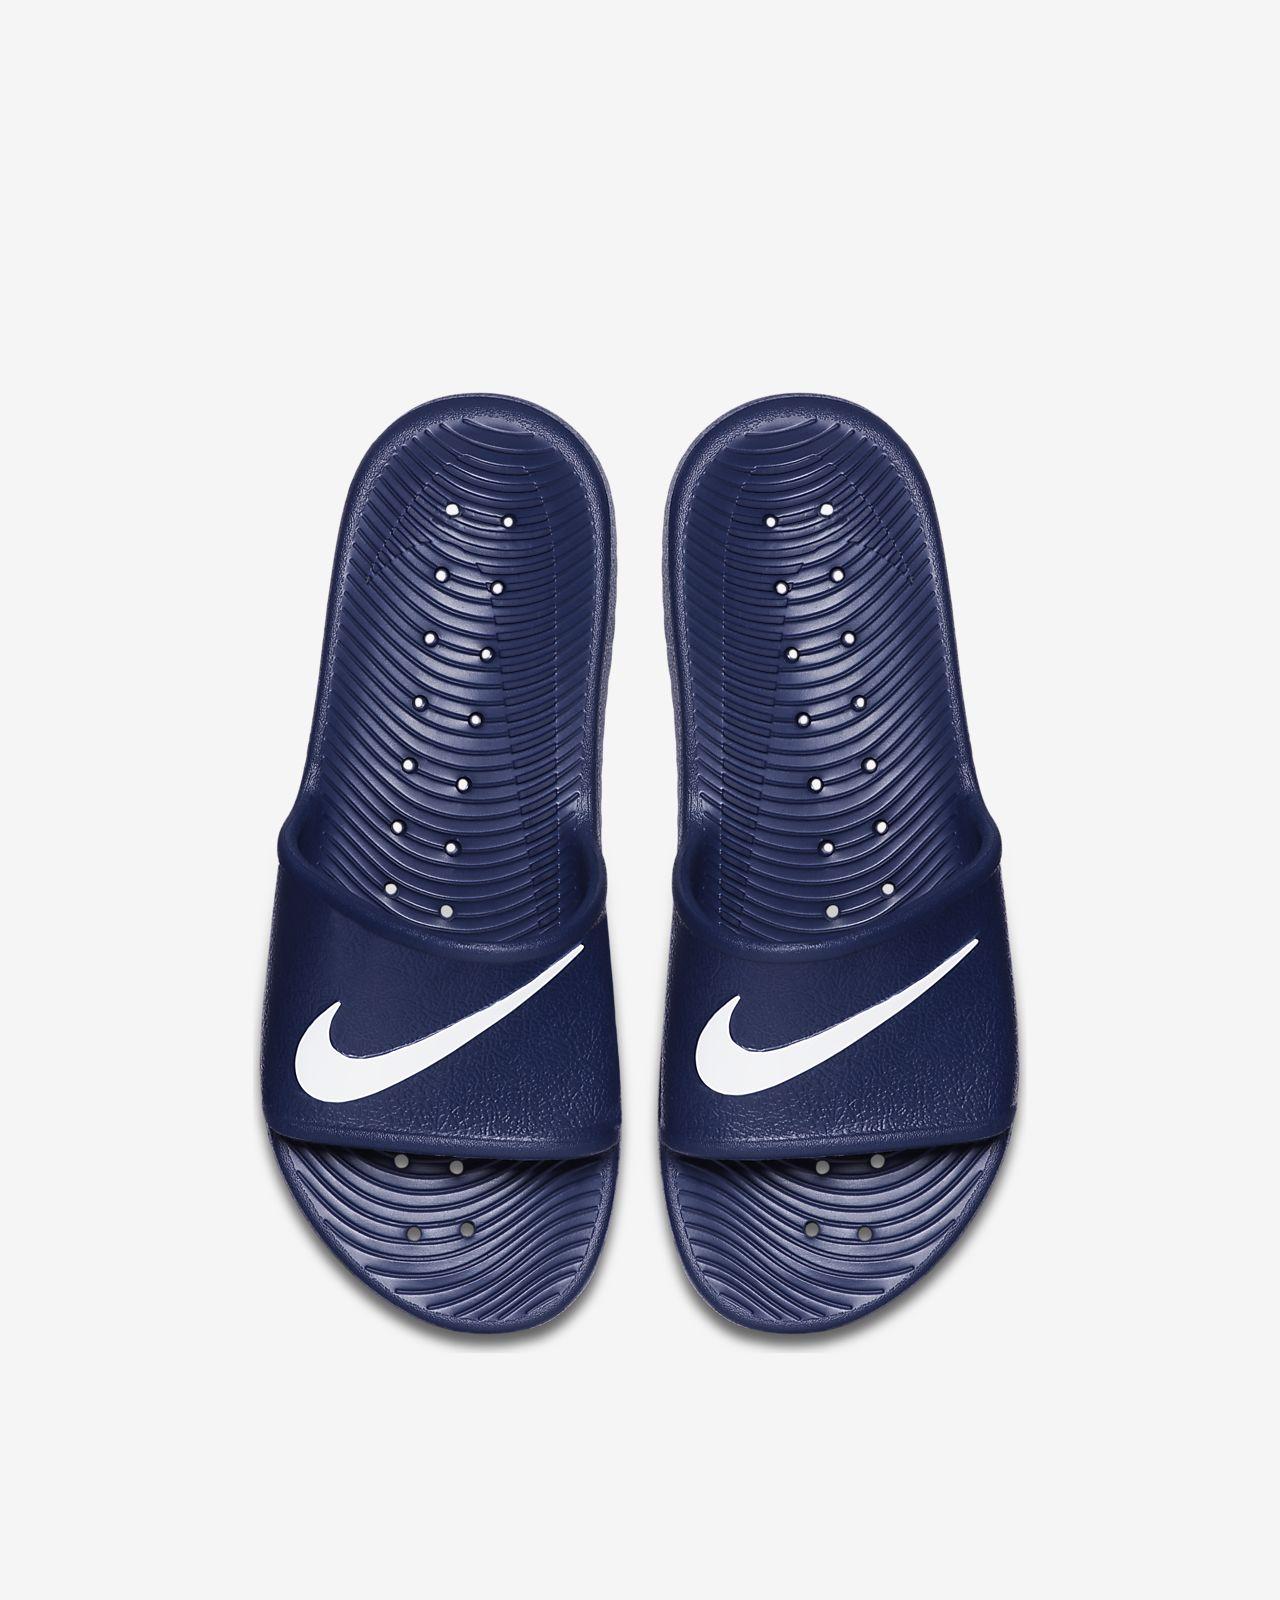 1da577fb91da4 Sandalia para hombre Nike Kawa Shower. Nike.com MX